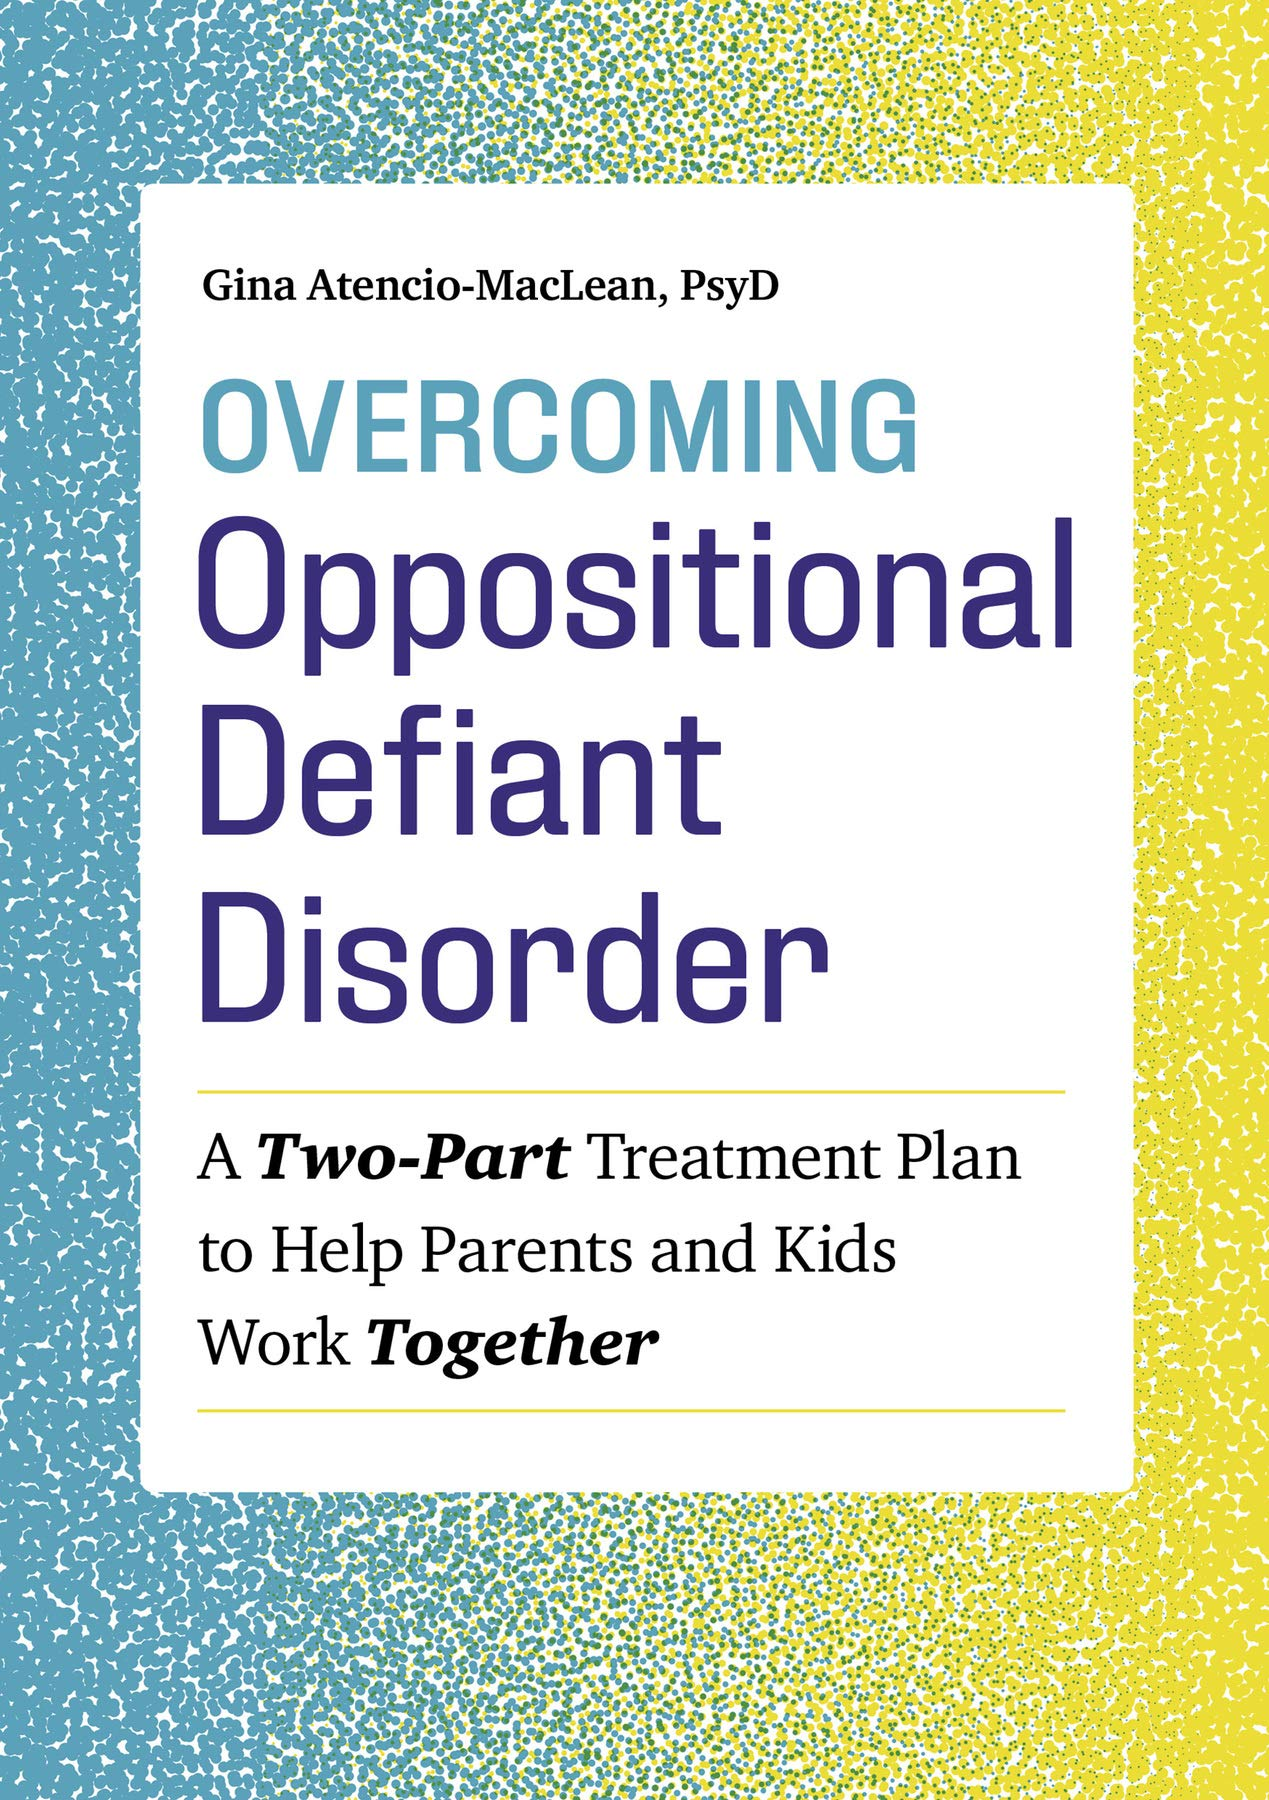 Oppositional Defiant Disorder Strategies Pdf